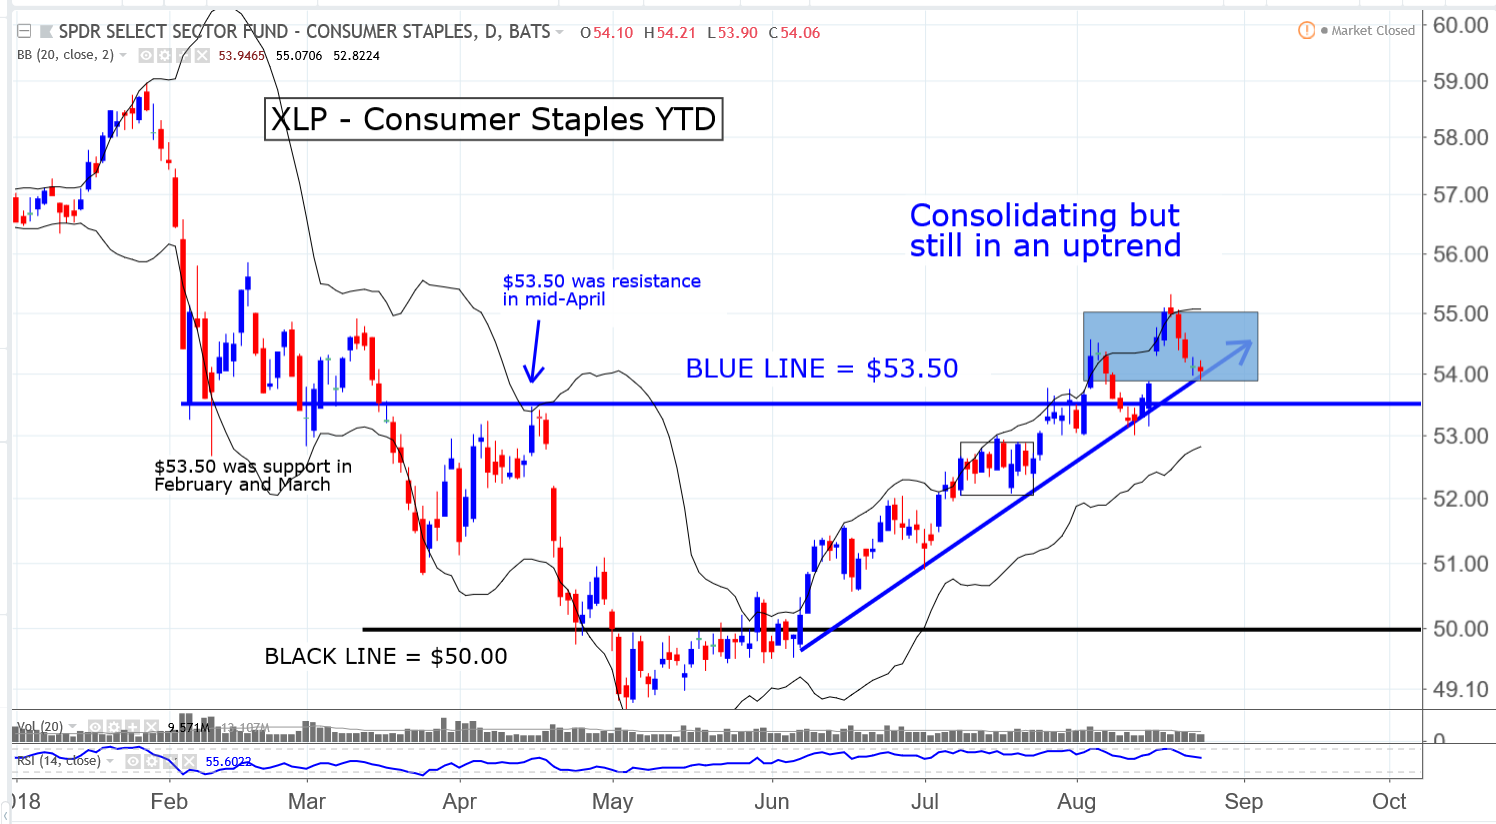 XLP S&P 500 Consumer Staples SPDR ETF